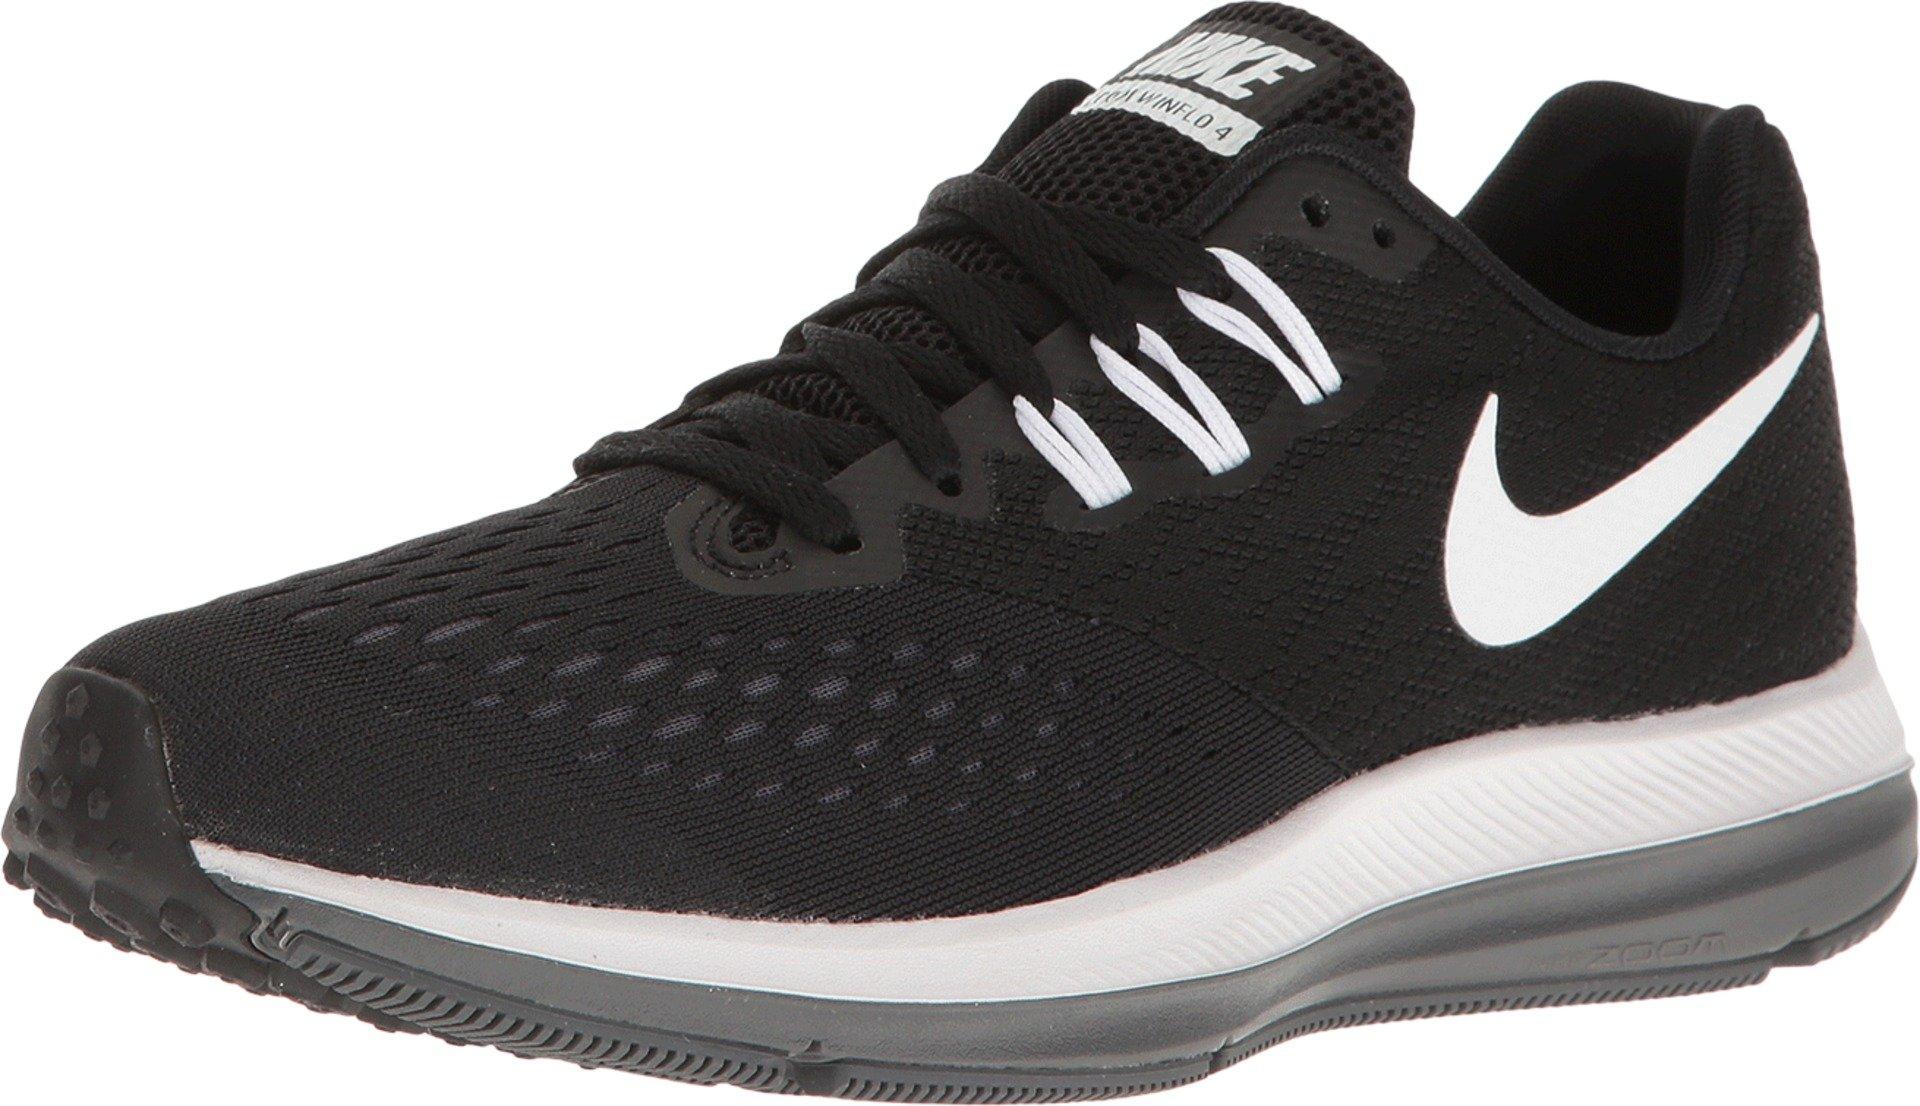 Nike Damen Zoom winflo 4 Running Sneaker 898485 Turnschuhe